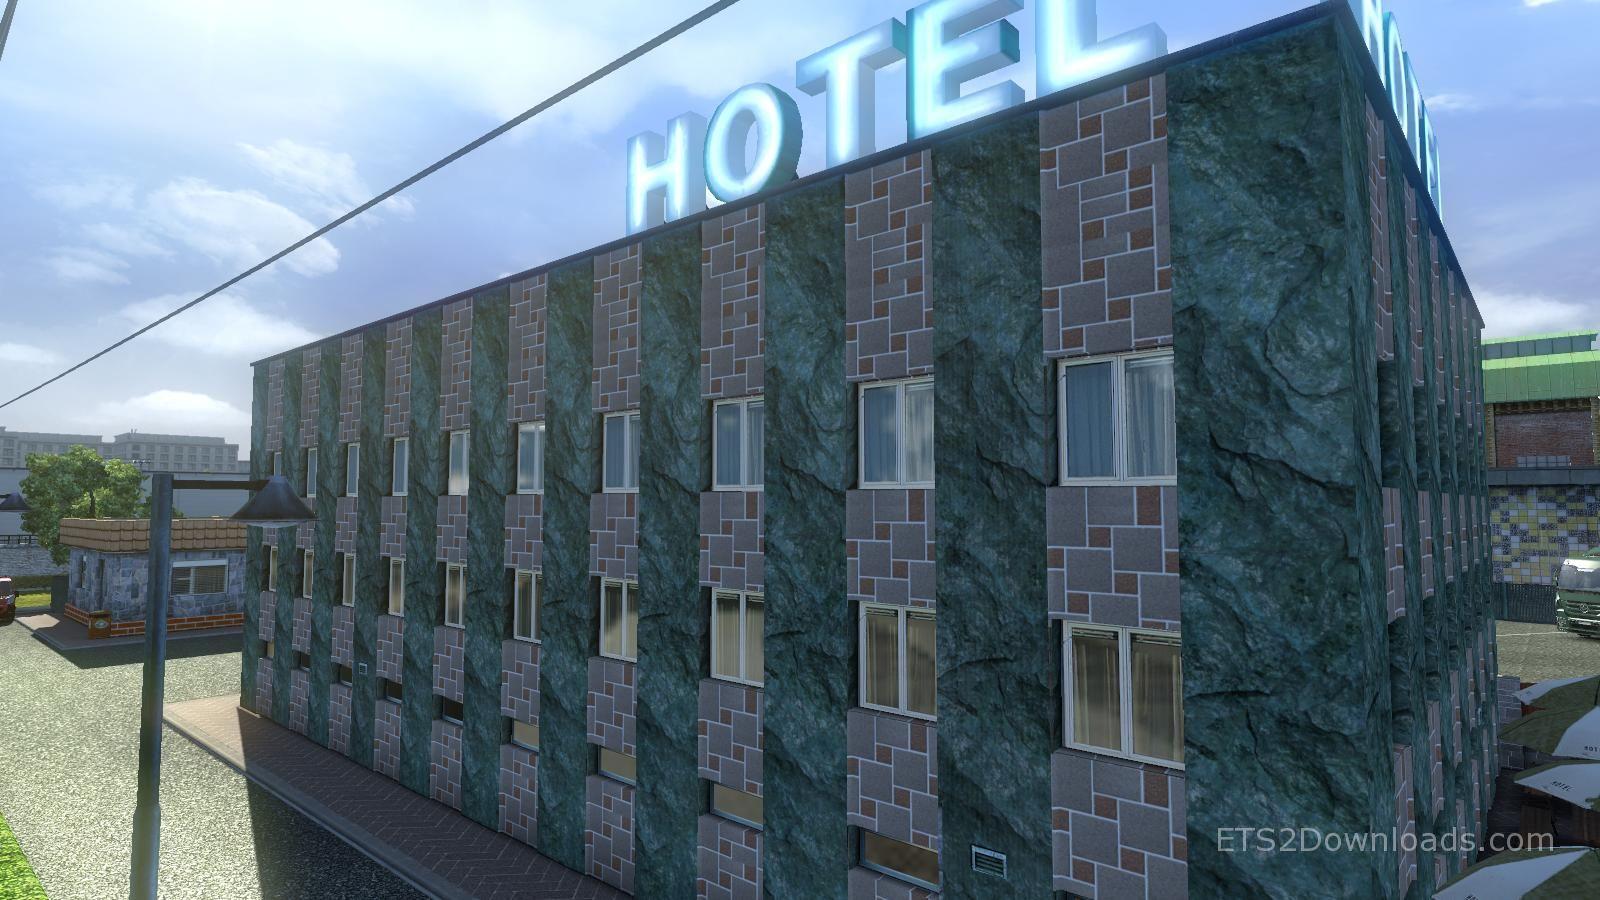 new-hotel-texture-2